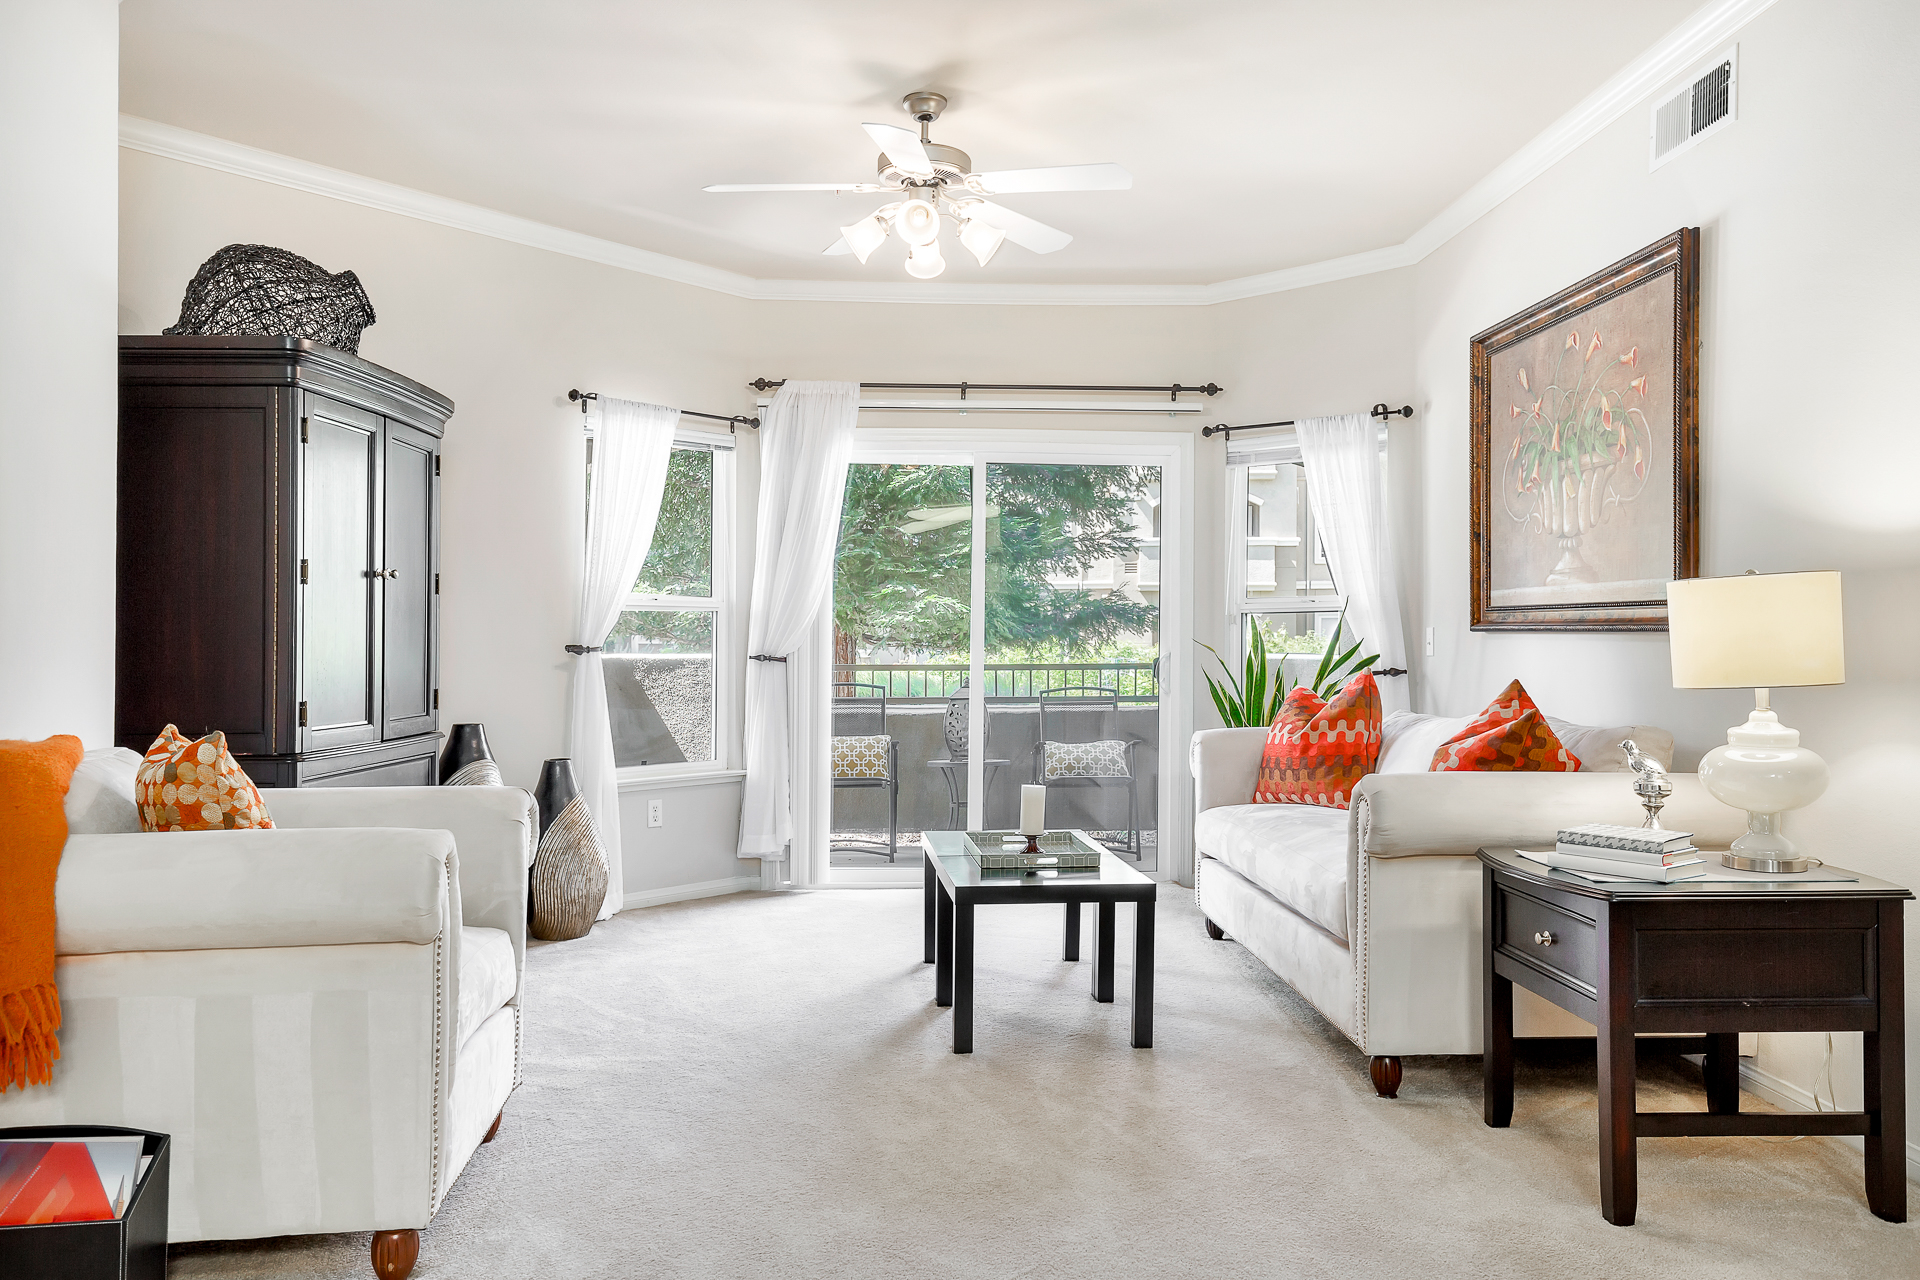 25-Sycamore-Terrace-Apartments-Photo-by-Brad-Ahlm-FairMarketPhoto-FullRes.jpg